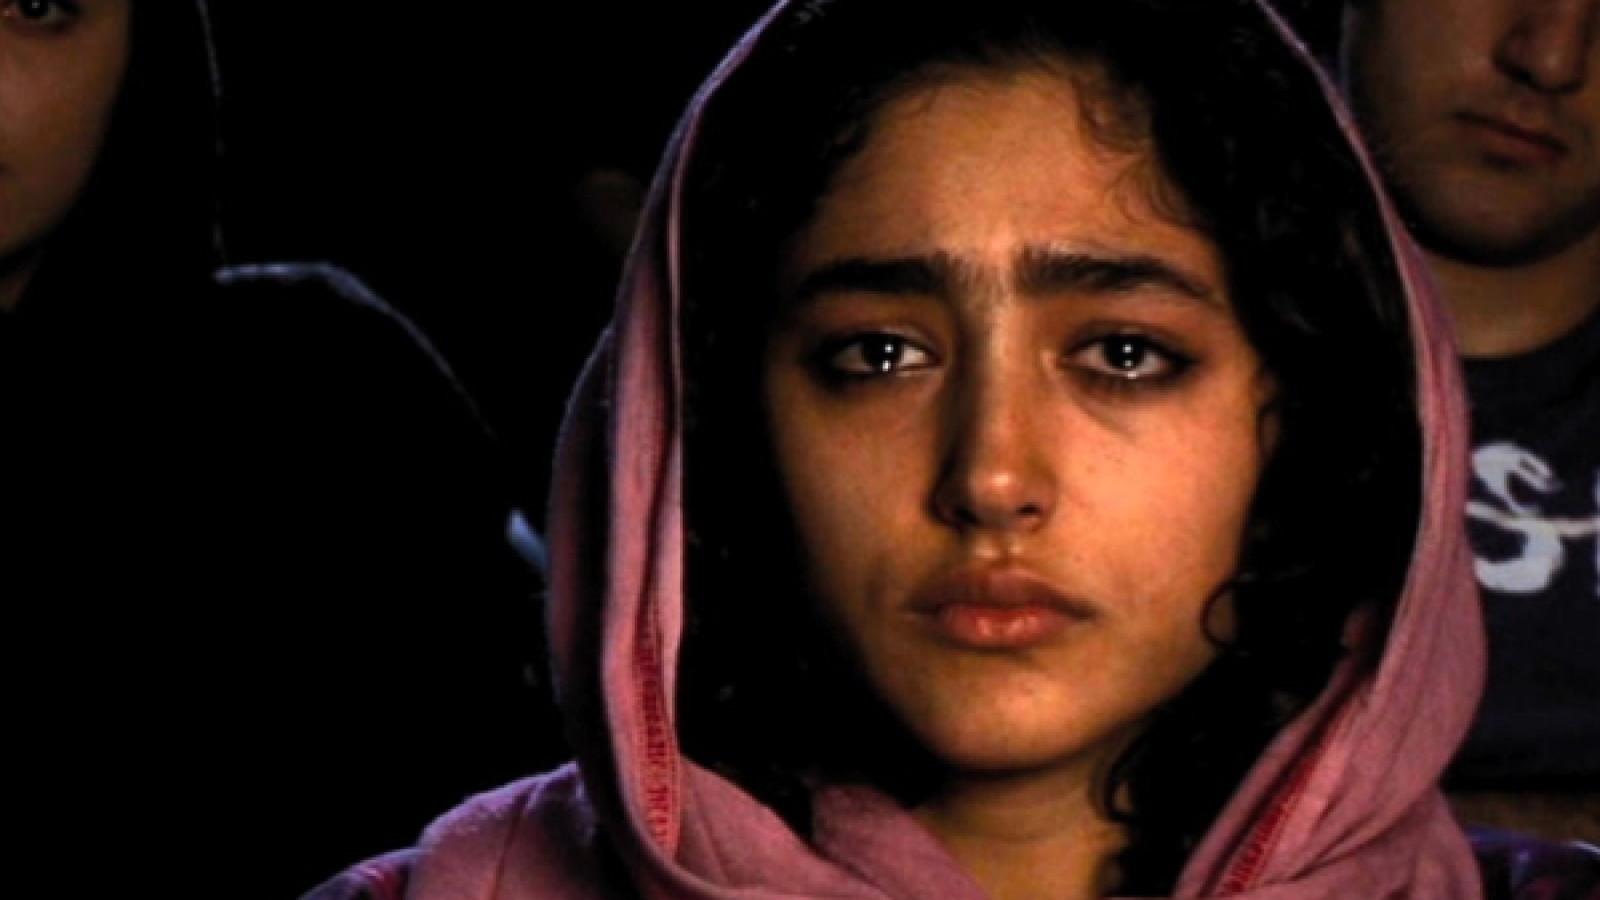 Shirin, directed by Abbas Kiarostami(2008)